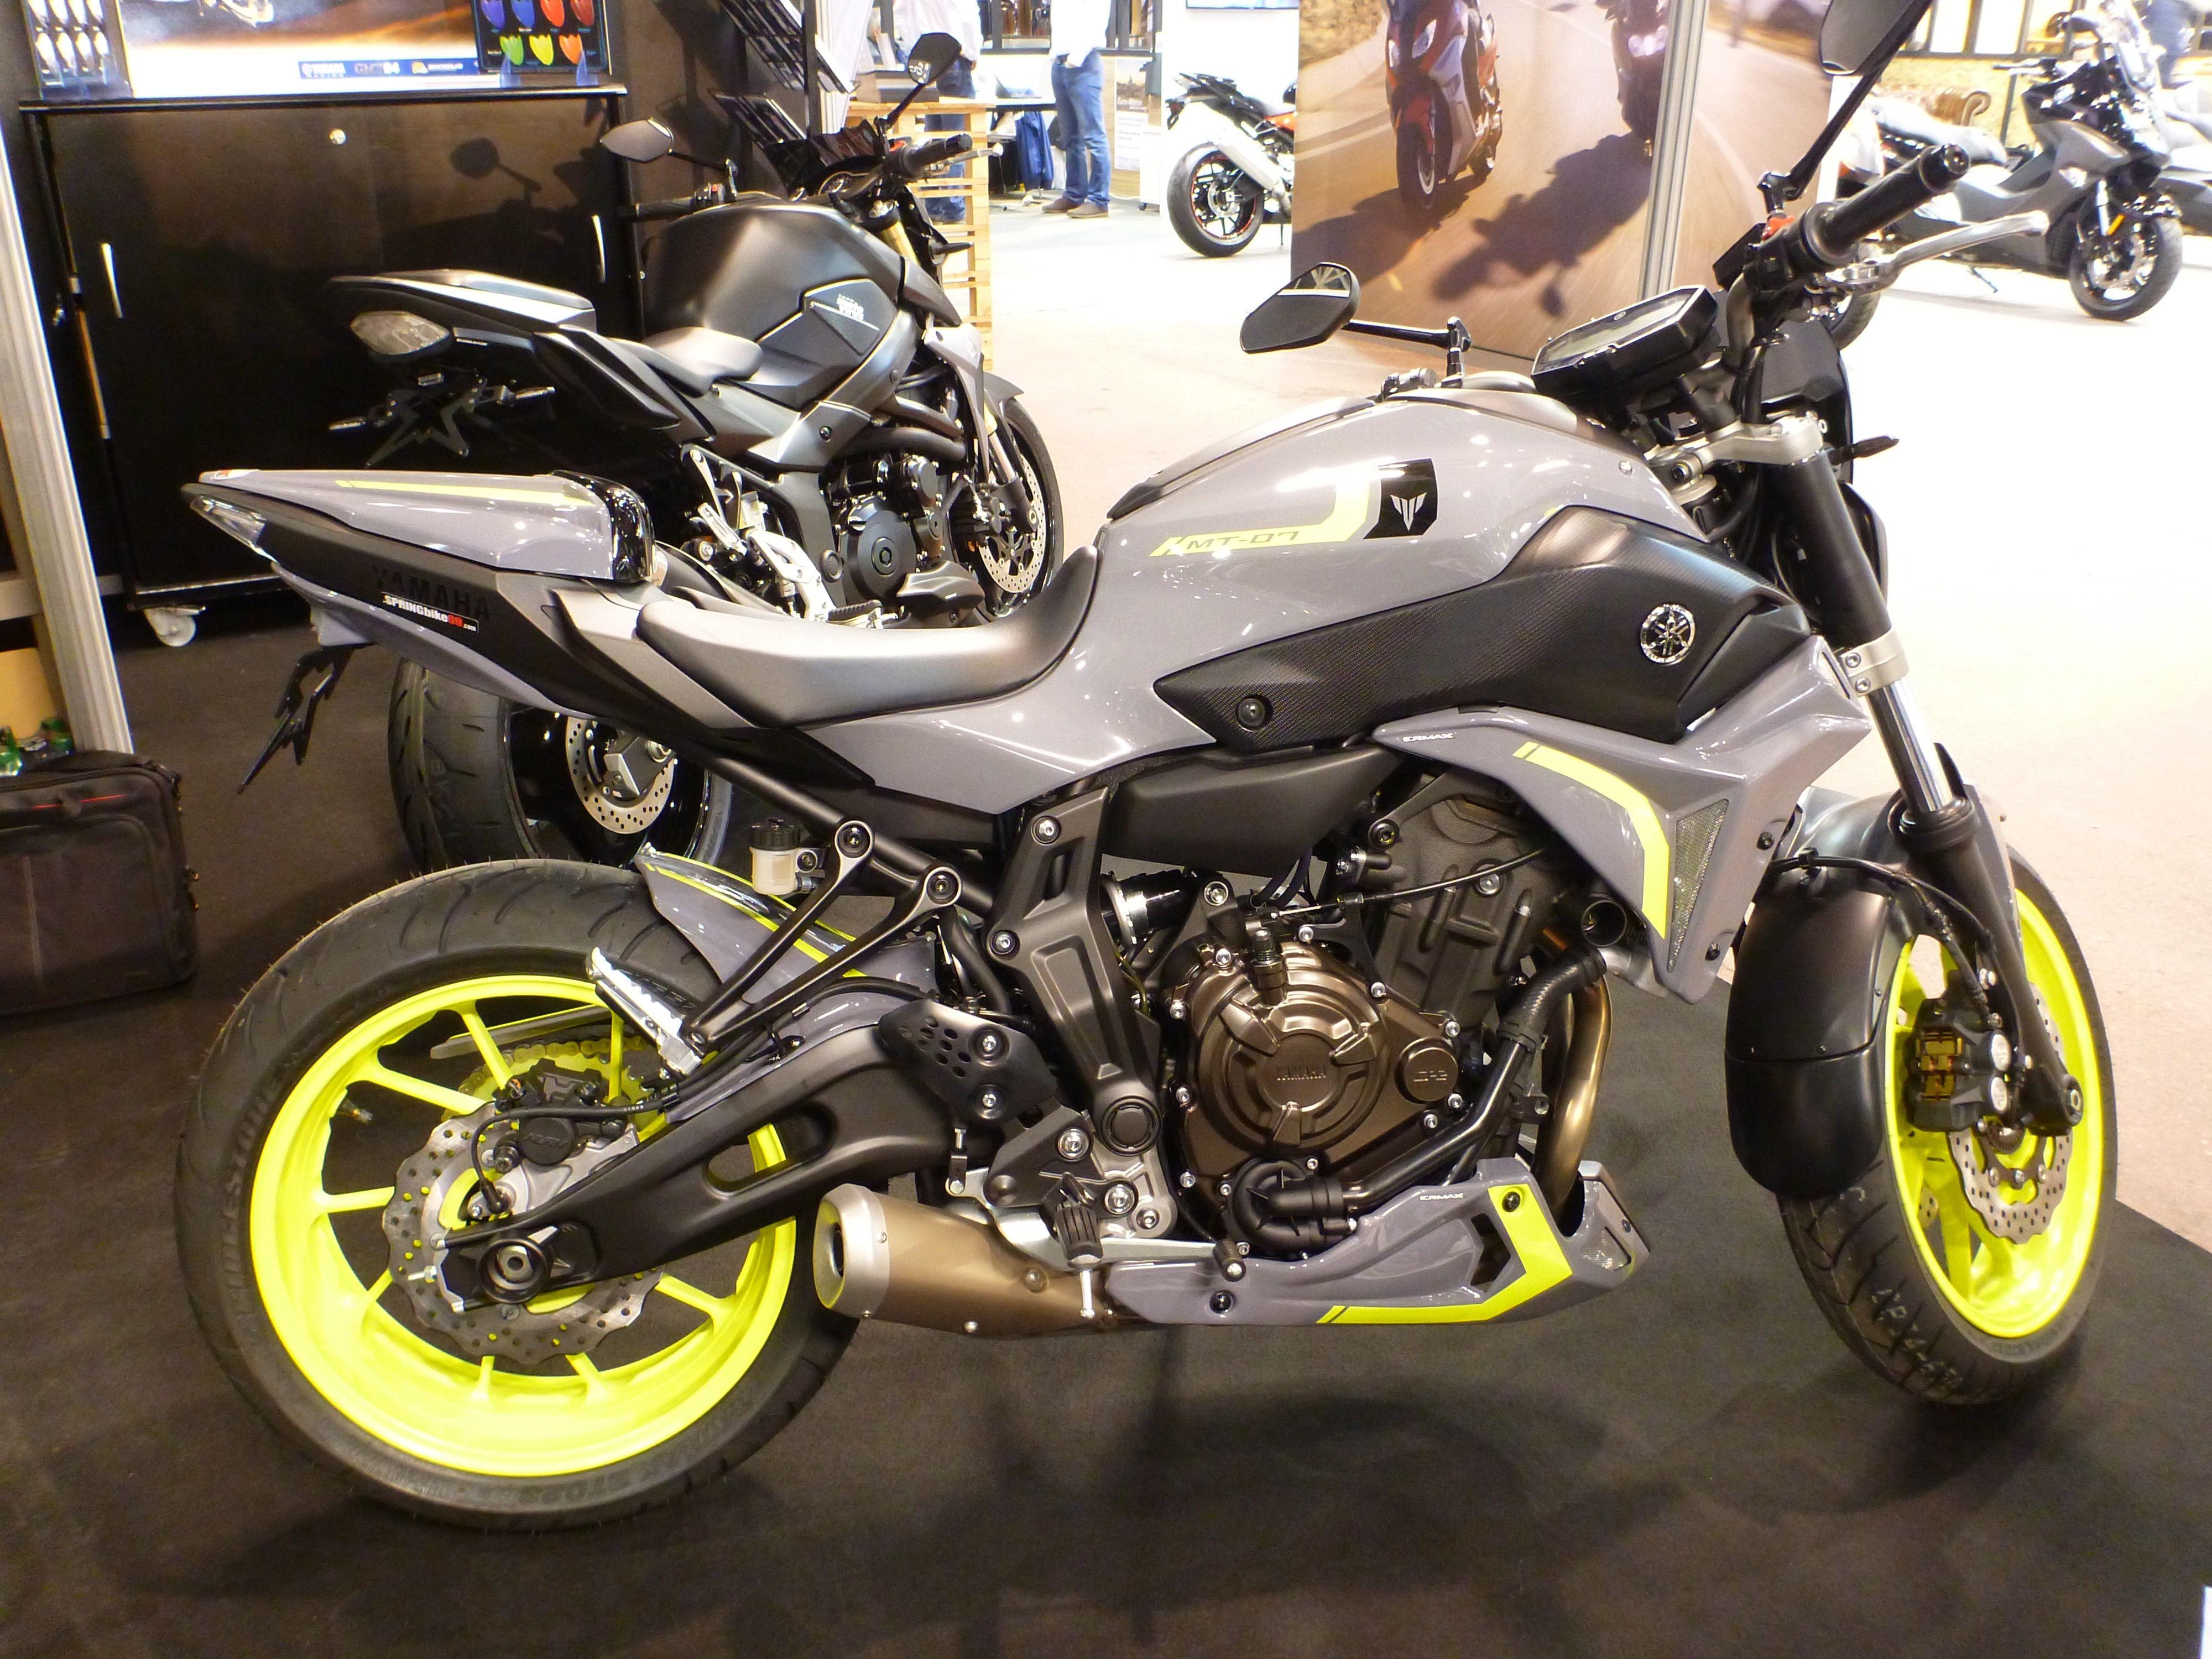 yamaha mt07 2016 twin colors by ermax design need for speed yamaha yamaha fz 09 motorbike. Black Bedroom Furniture Sets. Home Design Ideas